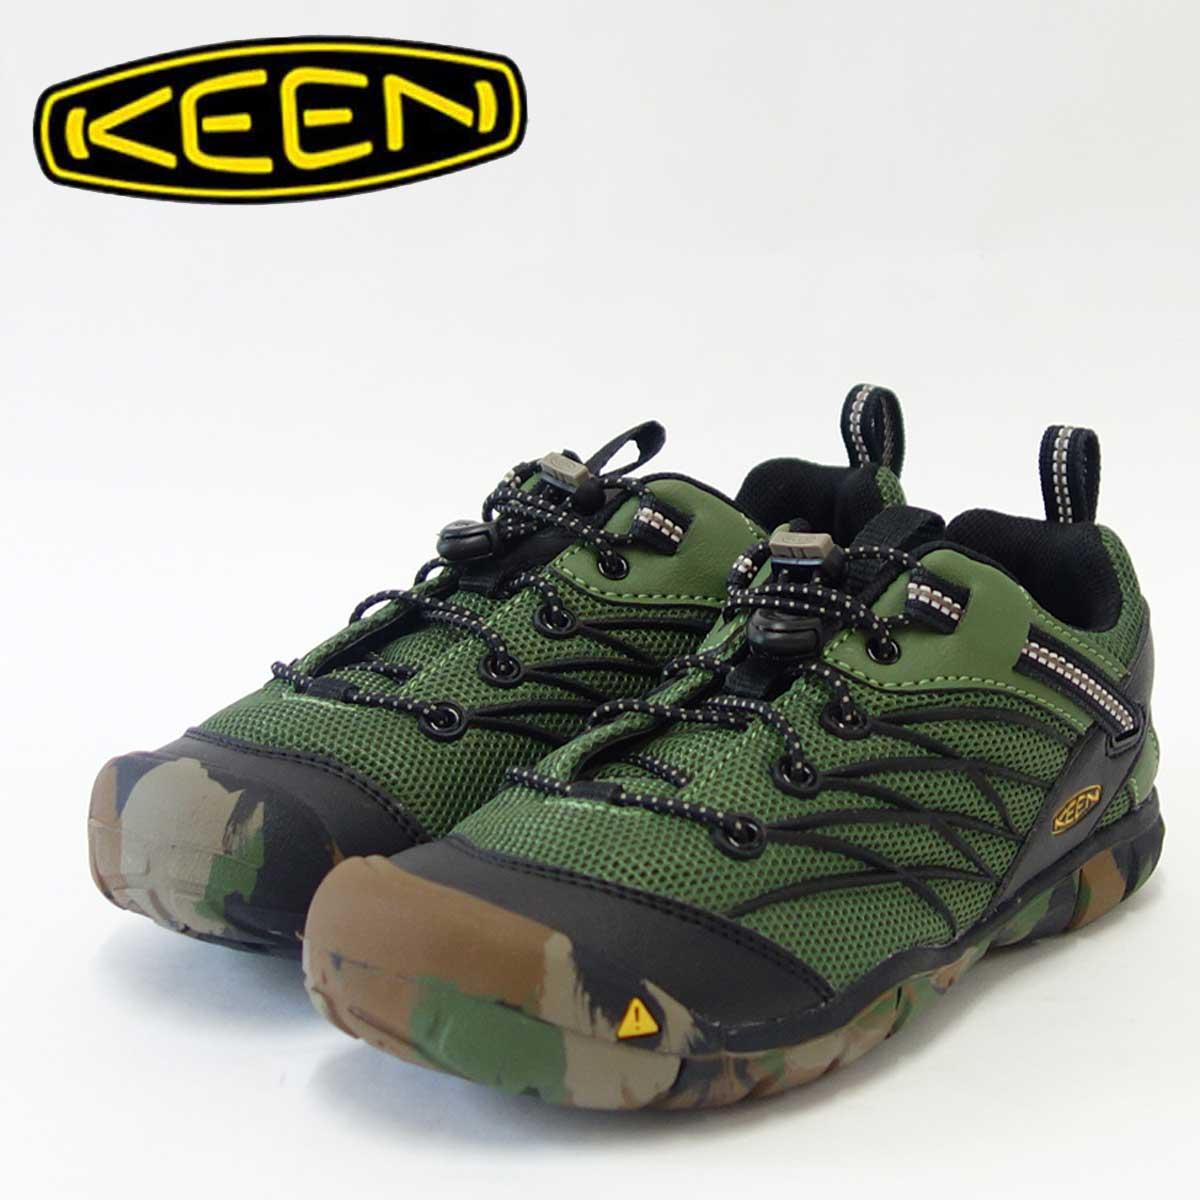 KEEN キーン KIDS Chabdler CNX1015508(キッズ)1015509チャンドラーシーエヌエックス カラー:Crushed Bronze Greenあらゆるアドベンチャーに対応する多目的シューズ「靴」